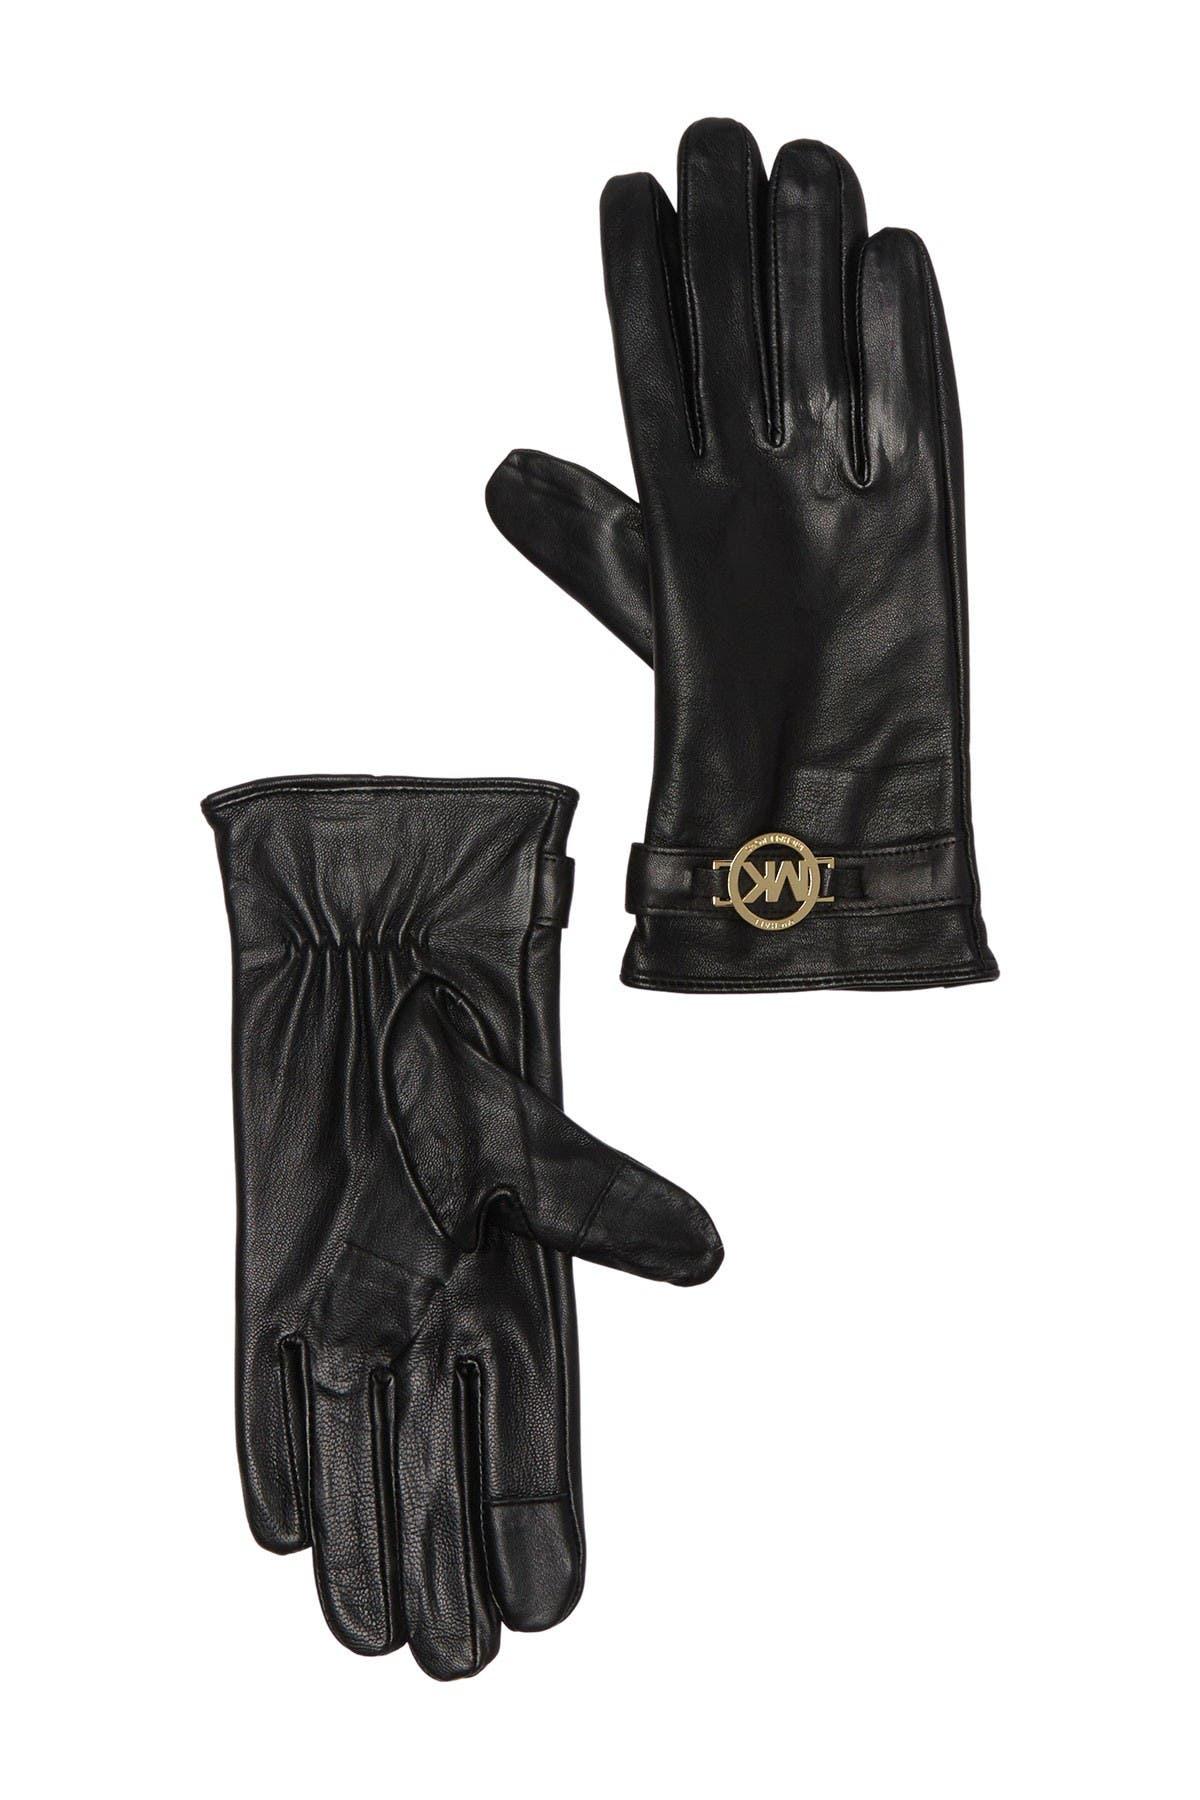 Image of Michael Kors Logo Charm Leather Gloves